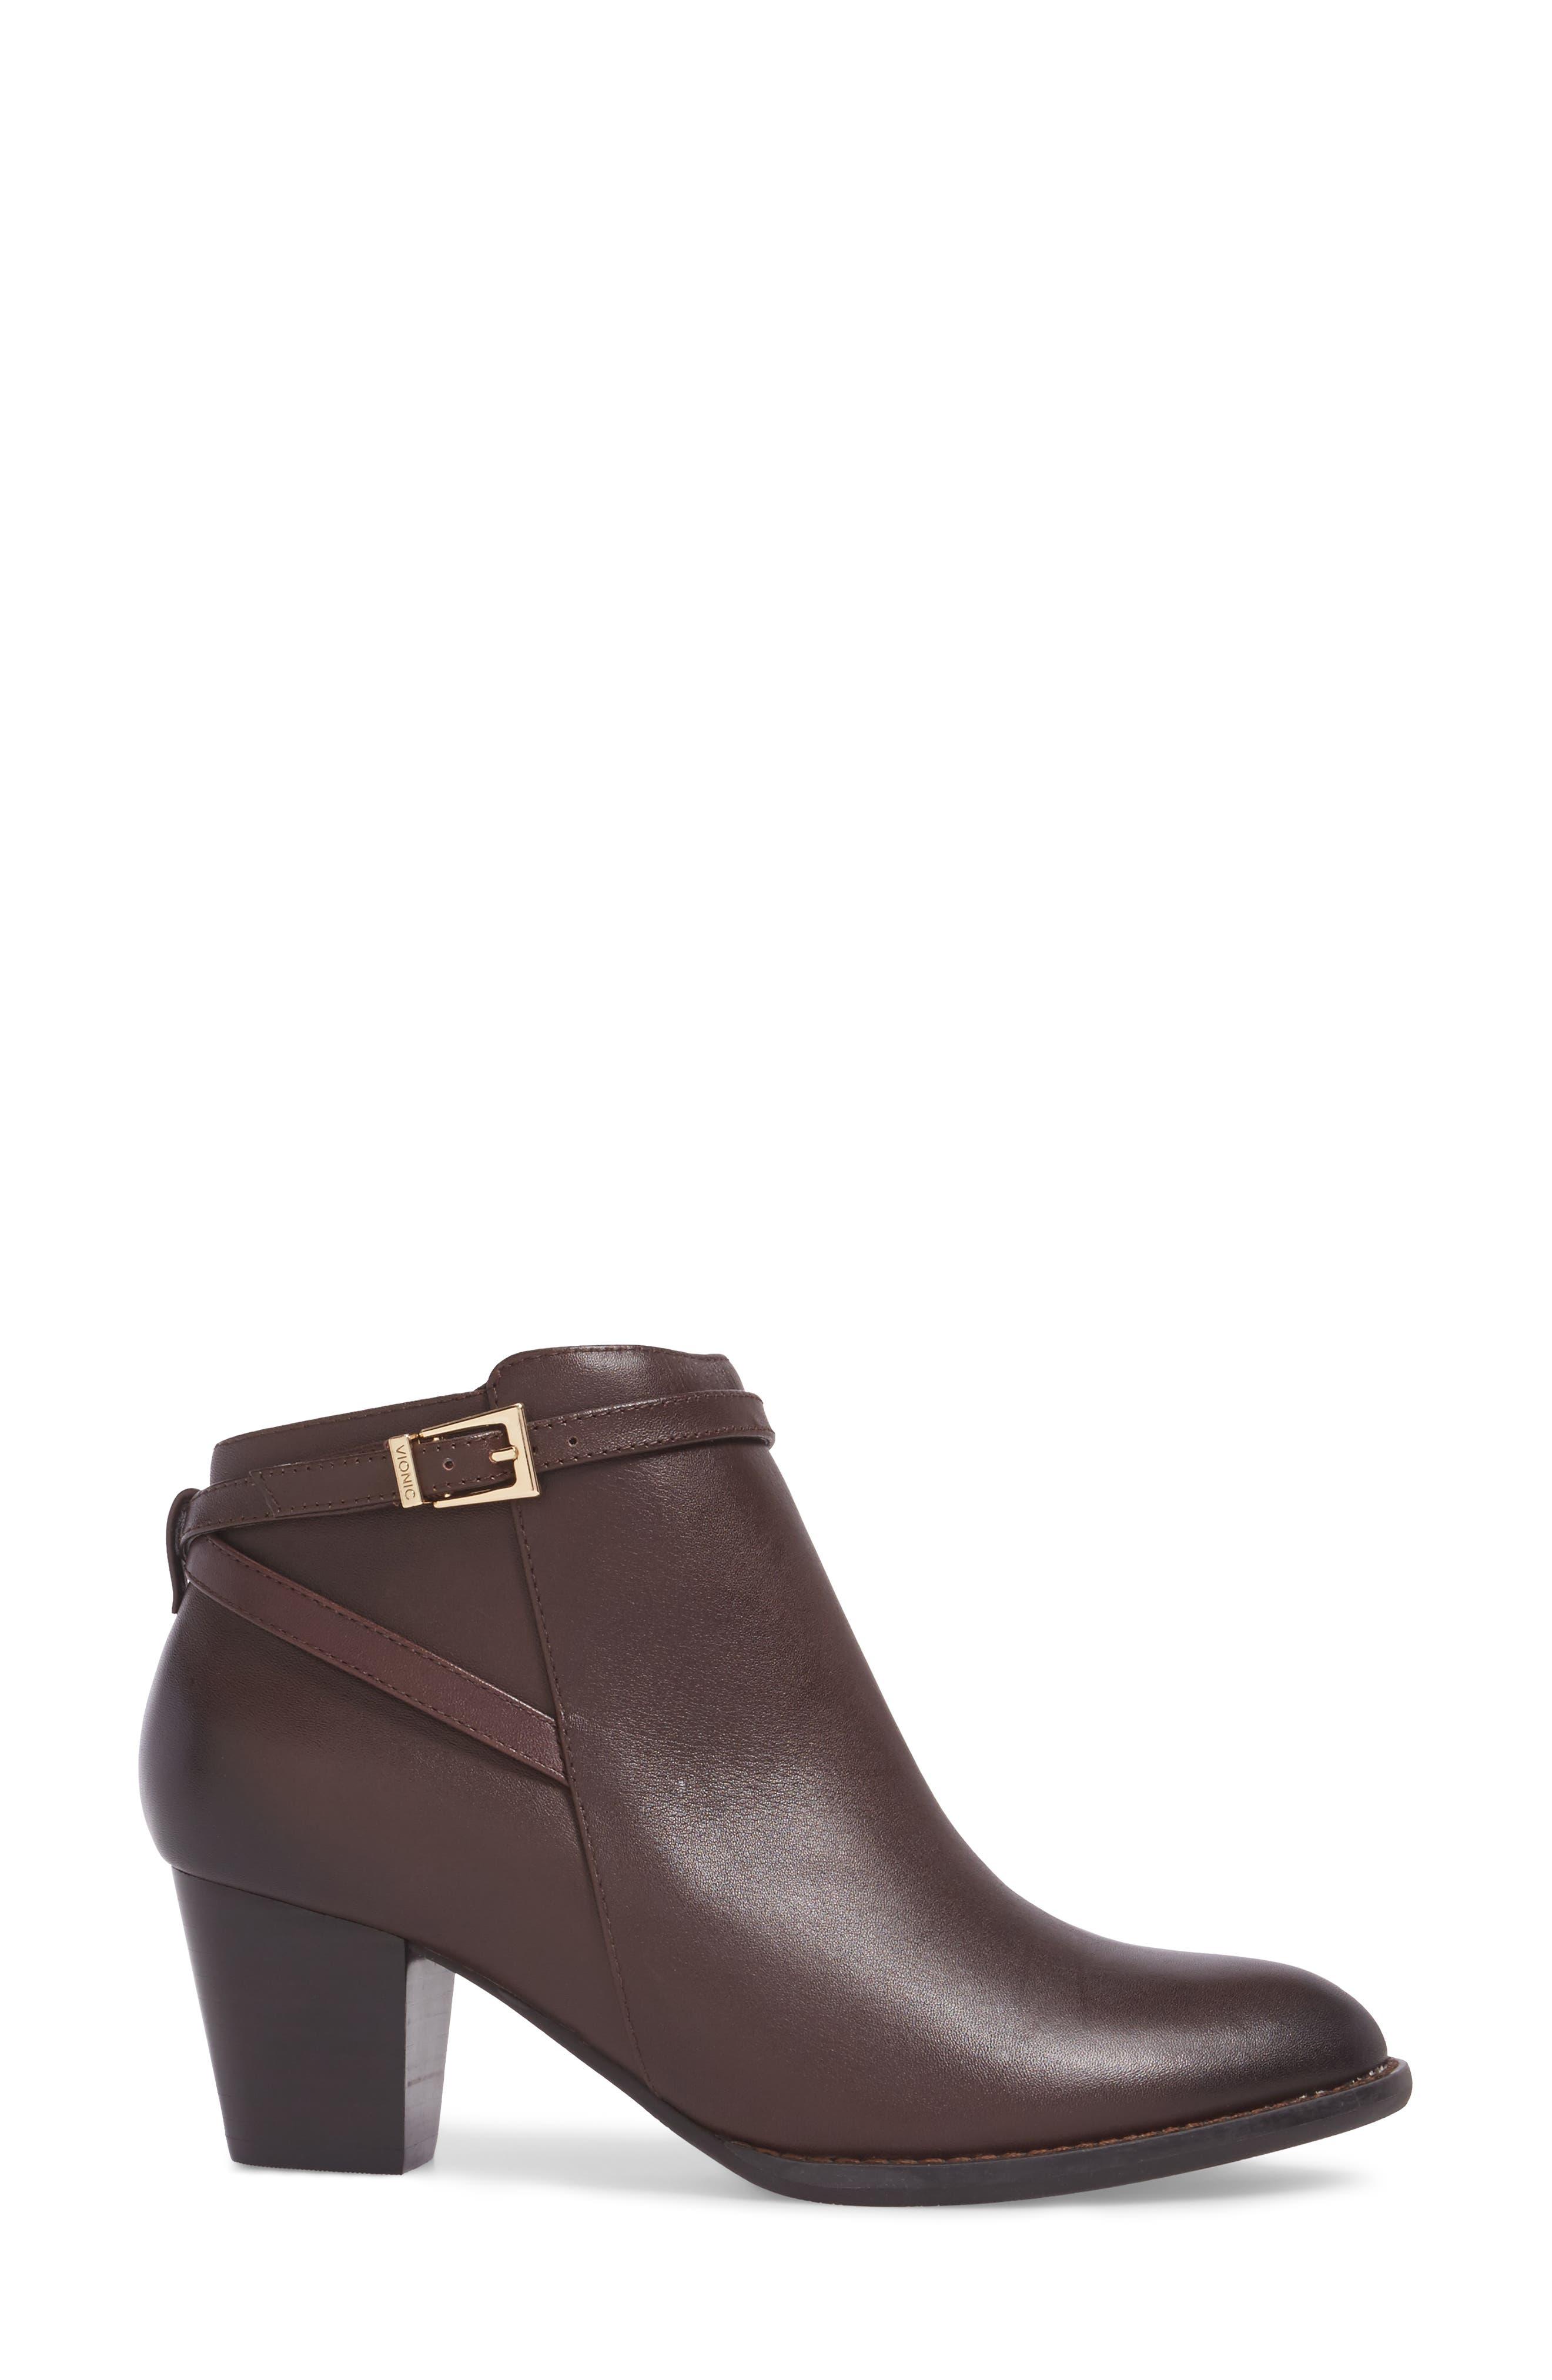 'Upton' Block Heel Boot,                             Alternate thumbnail 7, color,